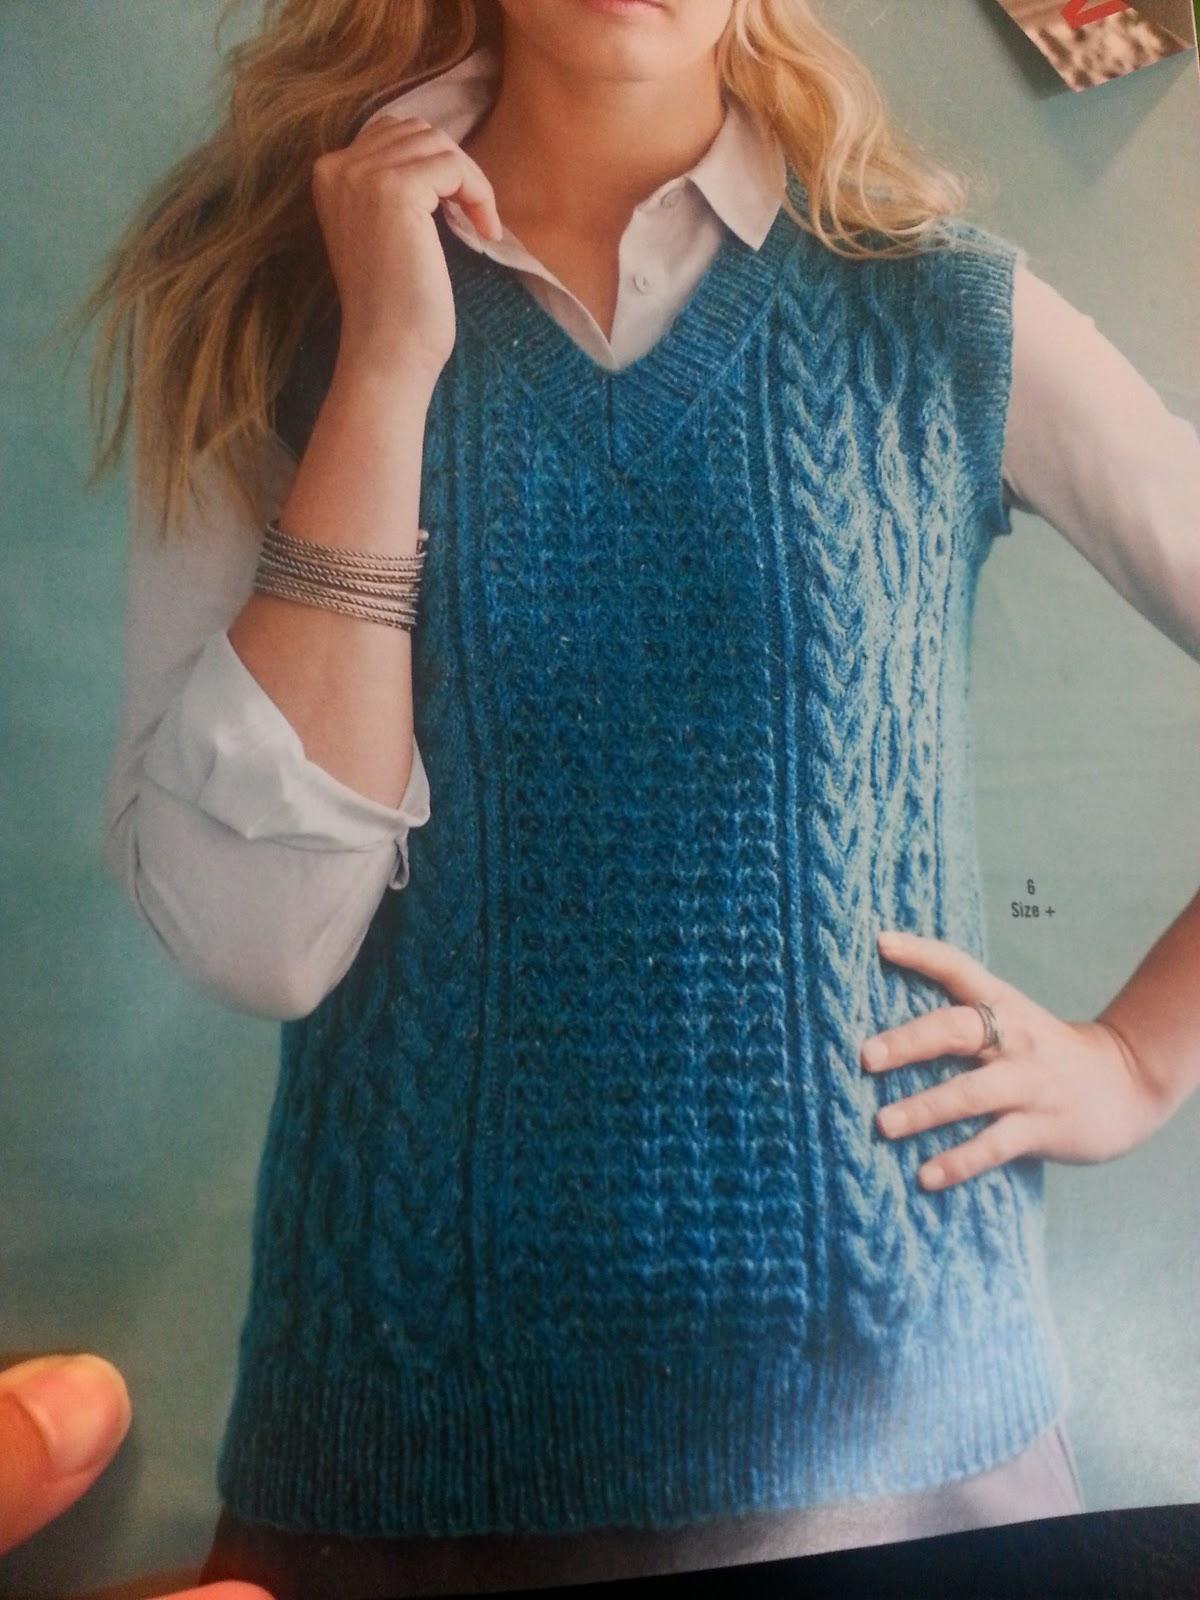 Knitting Vogue 2015 : Knitting tangled yarns tangledmania fall